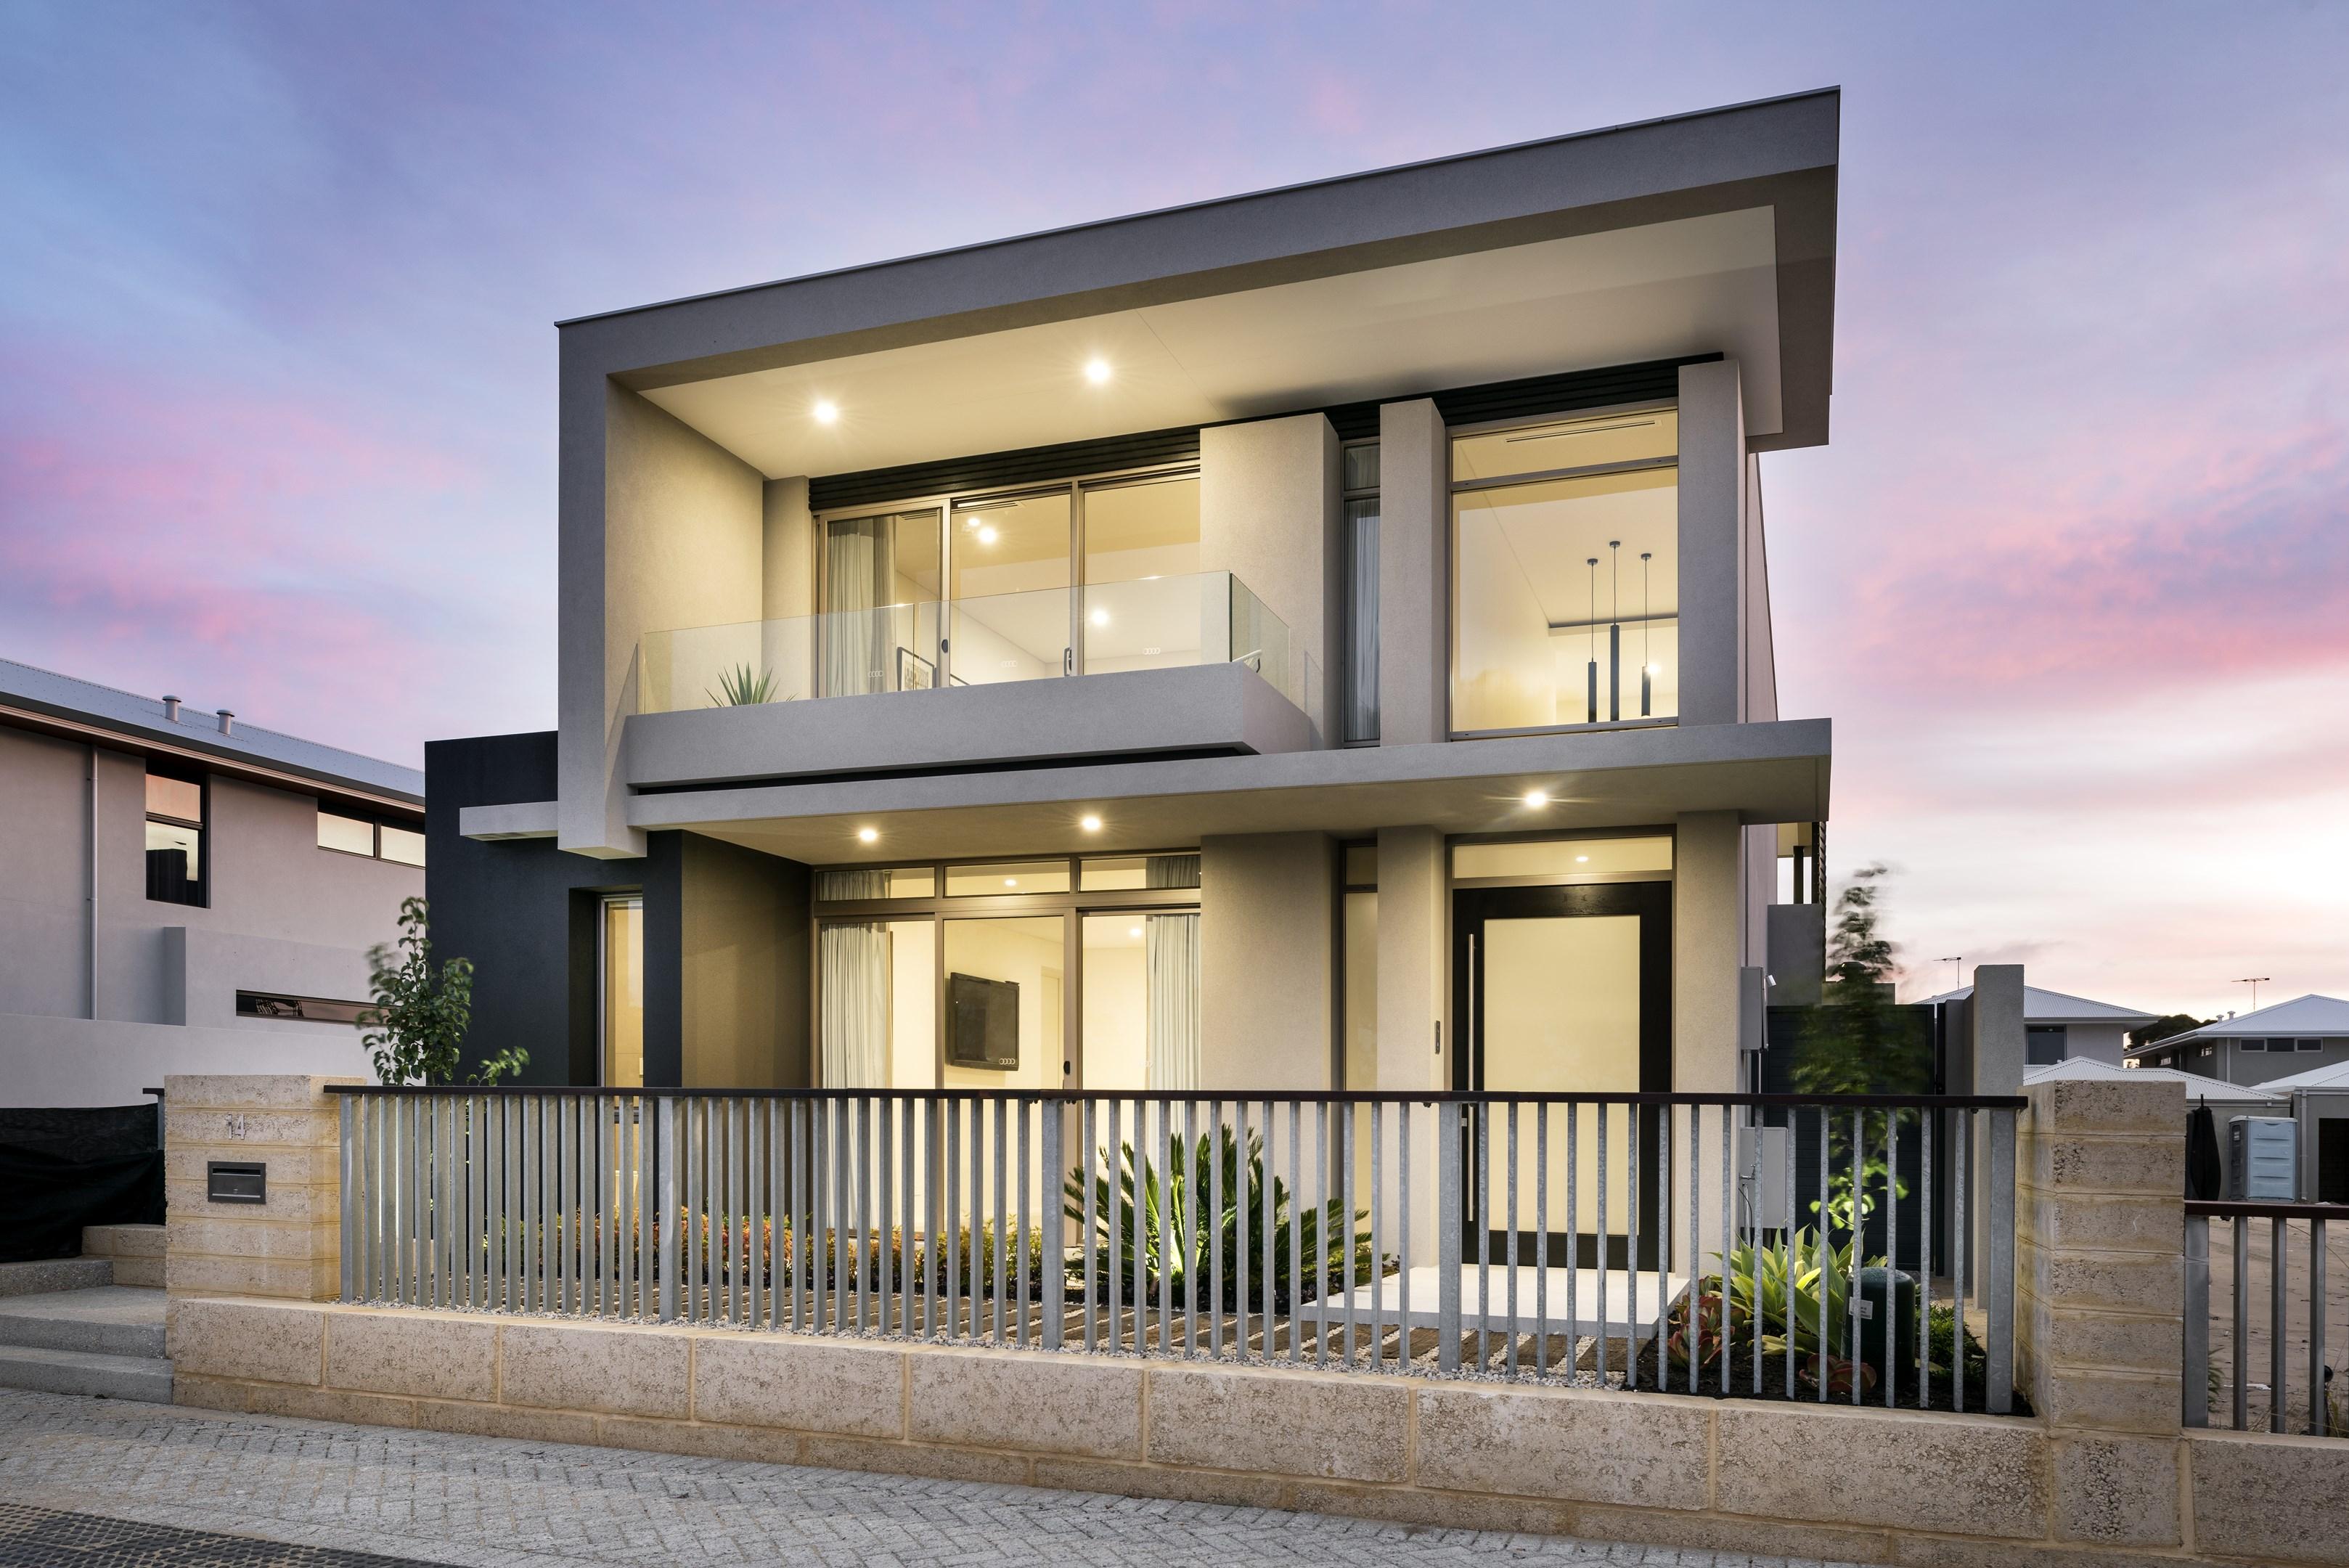 Property Report for 14 Gemstone Boulevard, Carine WA 6020